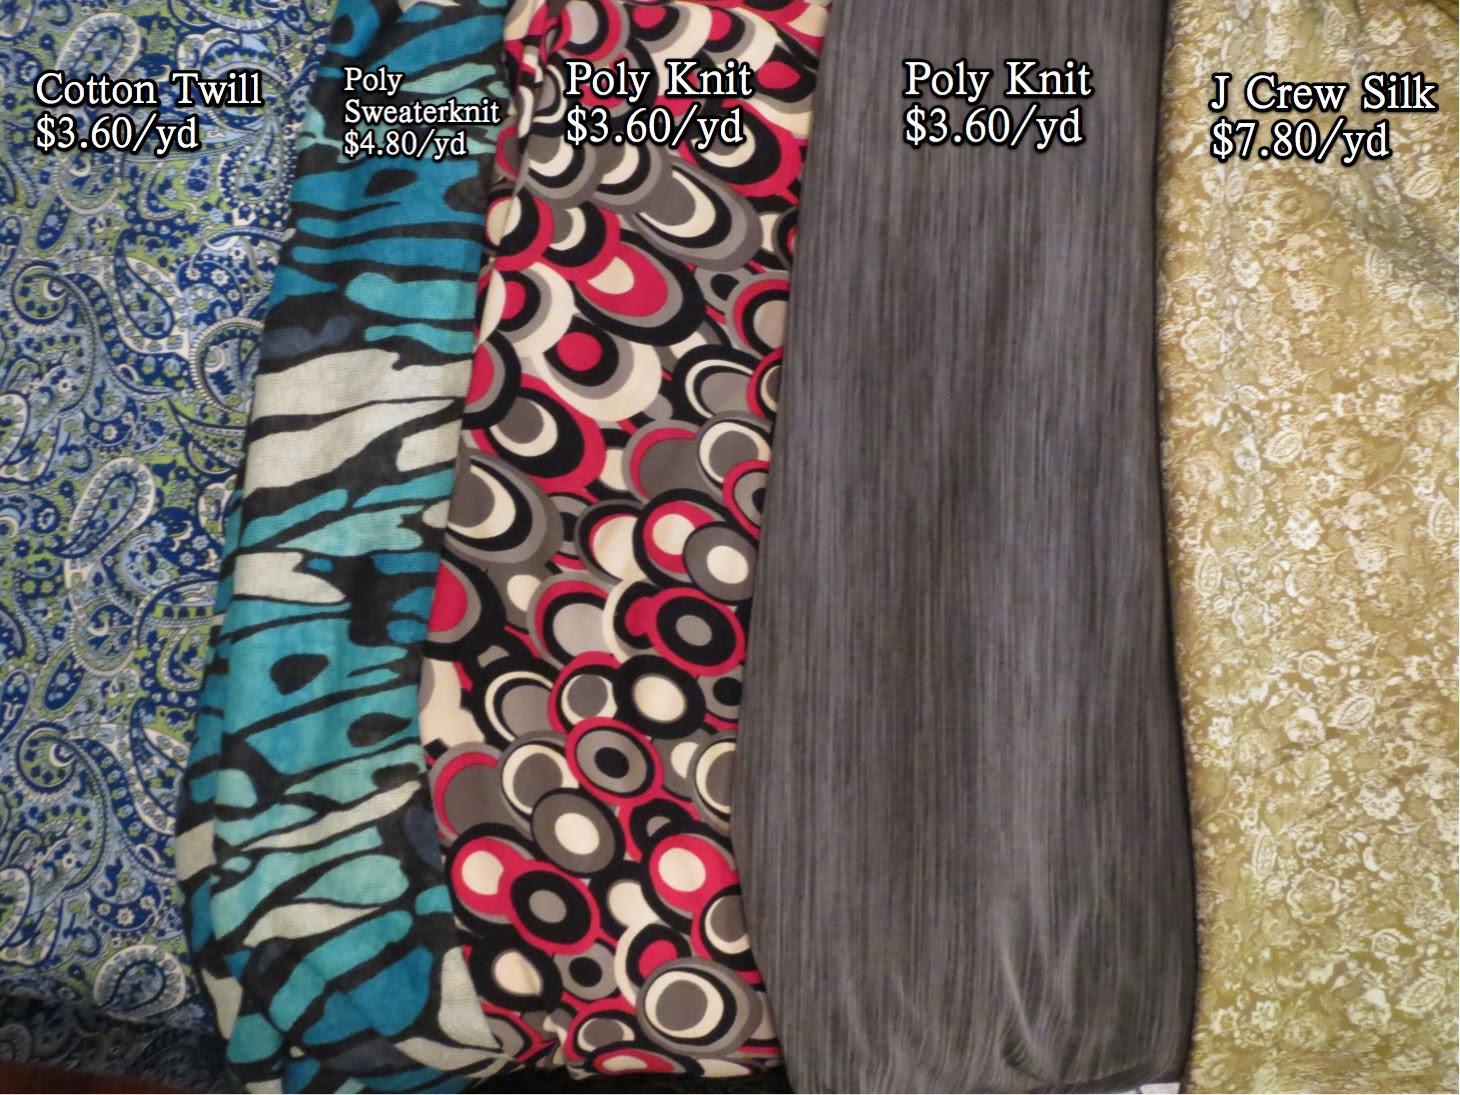 Fabric Mart 10-2013 40% Off Sale